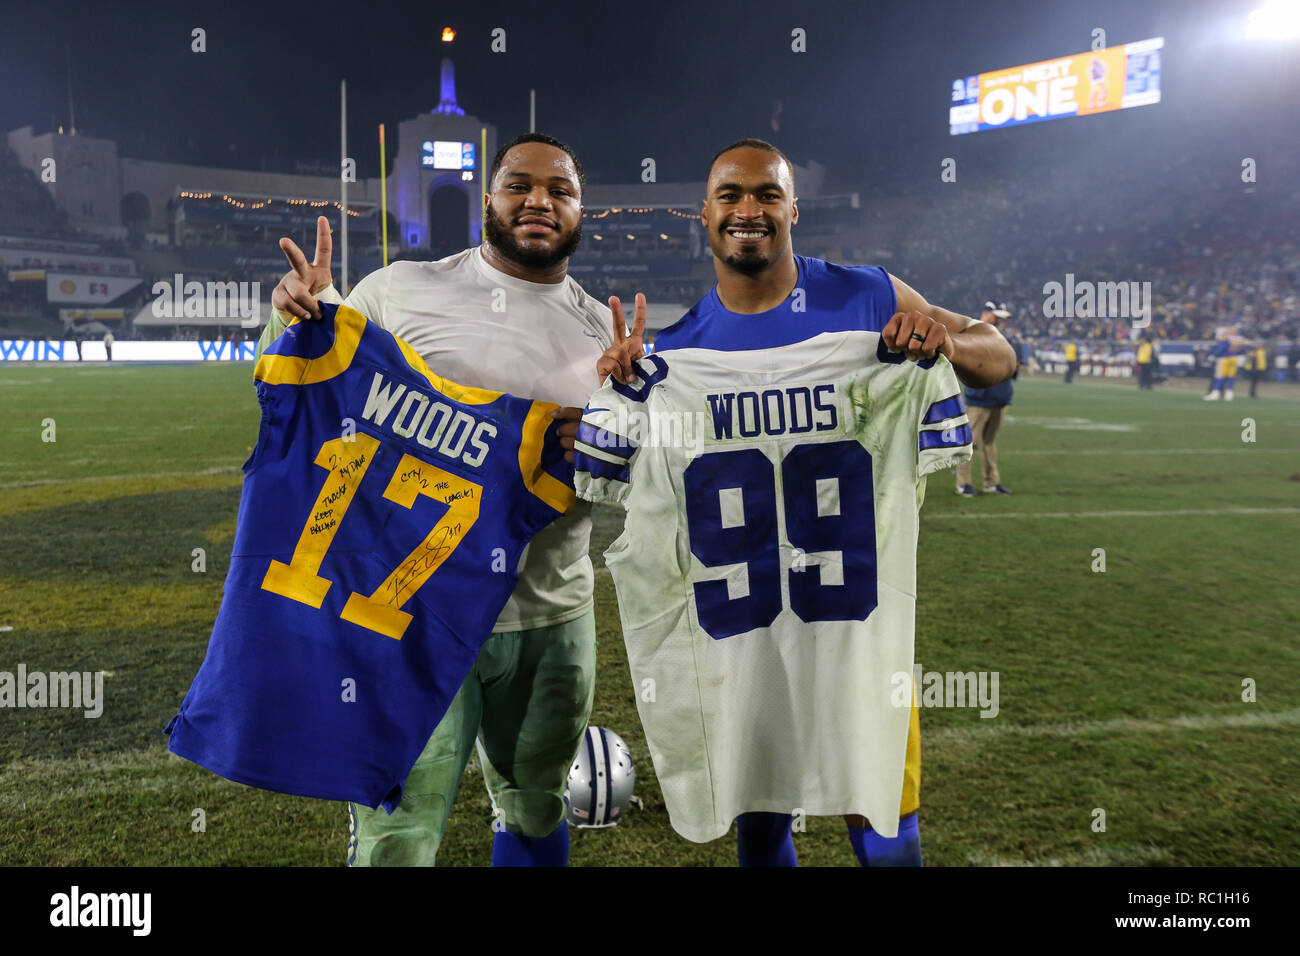 new york cac46 3d4b2 Los Angeles, CA, USA. 12th Jan, 2019. Los Angeles Rams wide ...